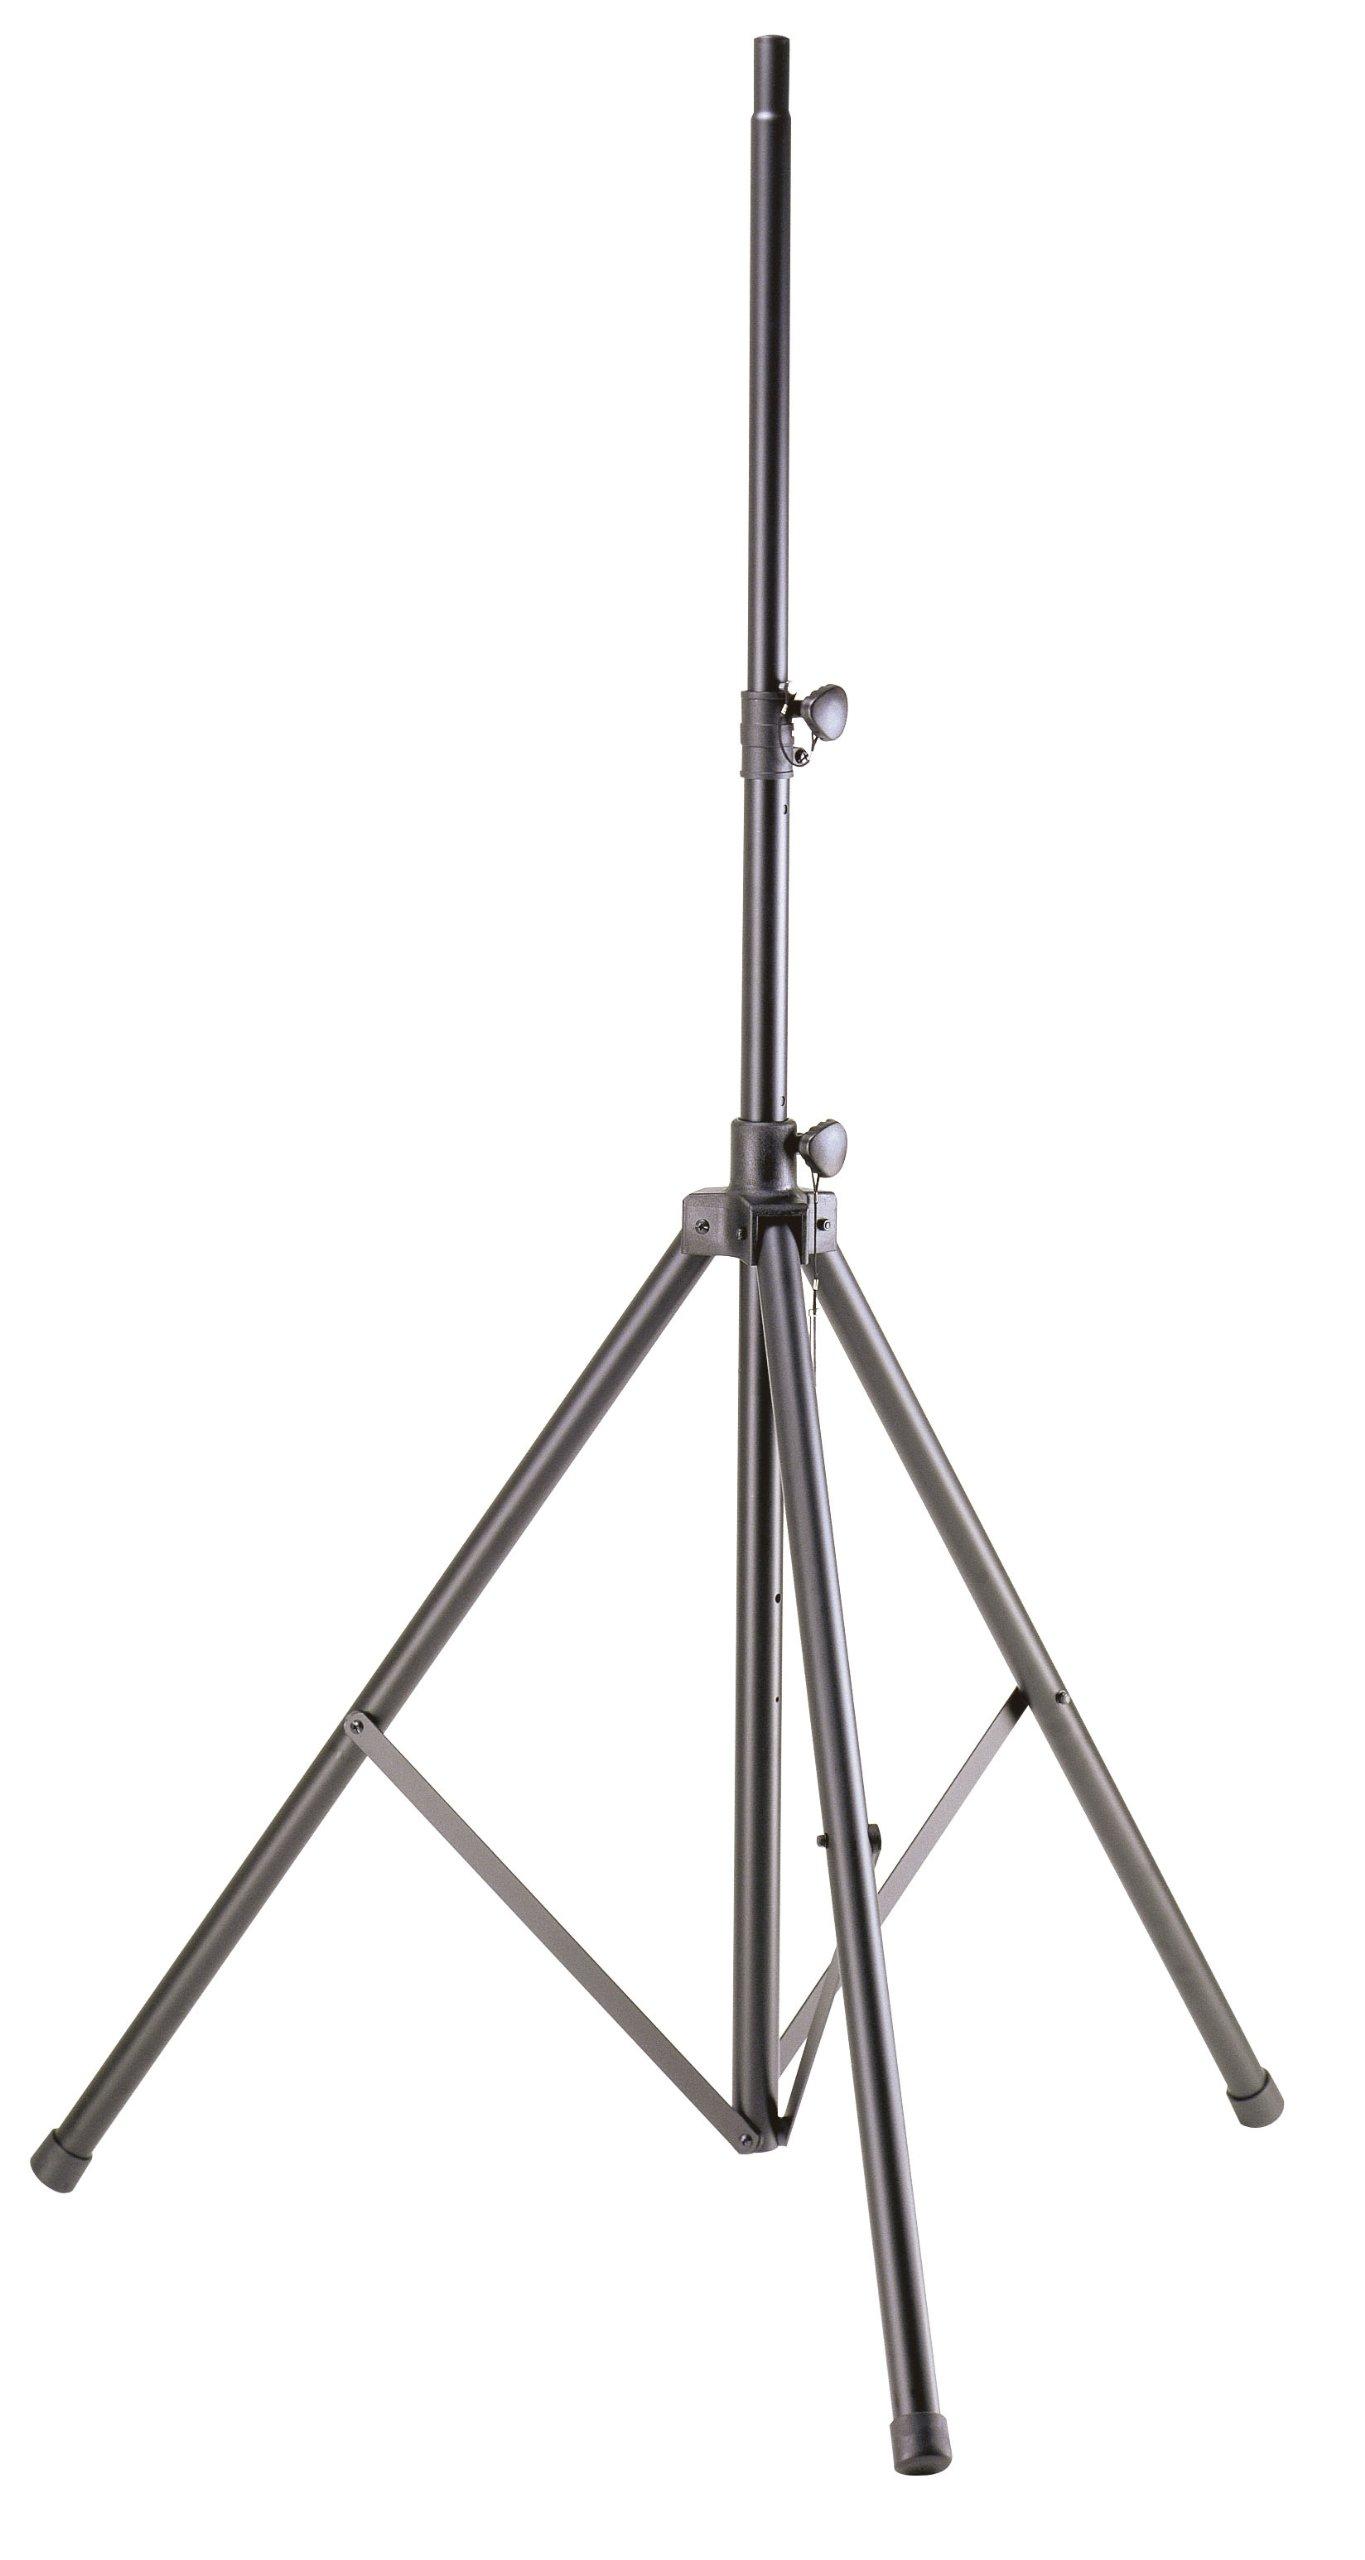 Odyssey LTS2 9.5' Speaker Tripod Stand